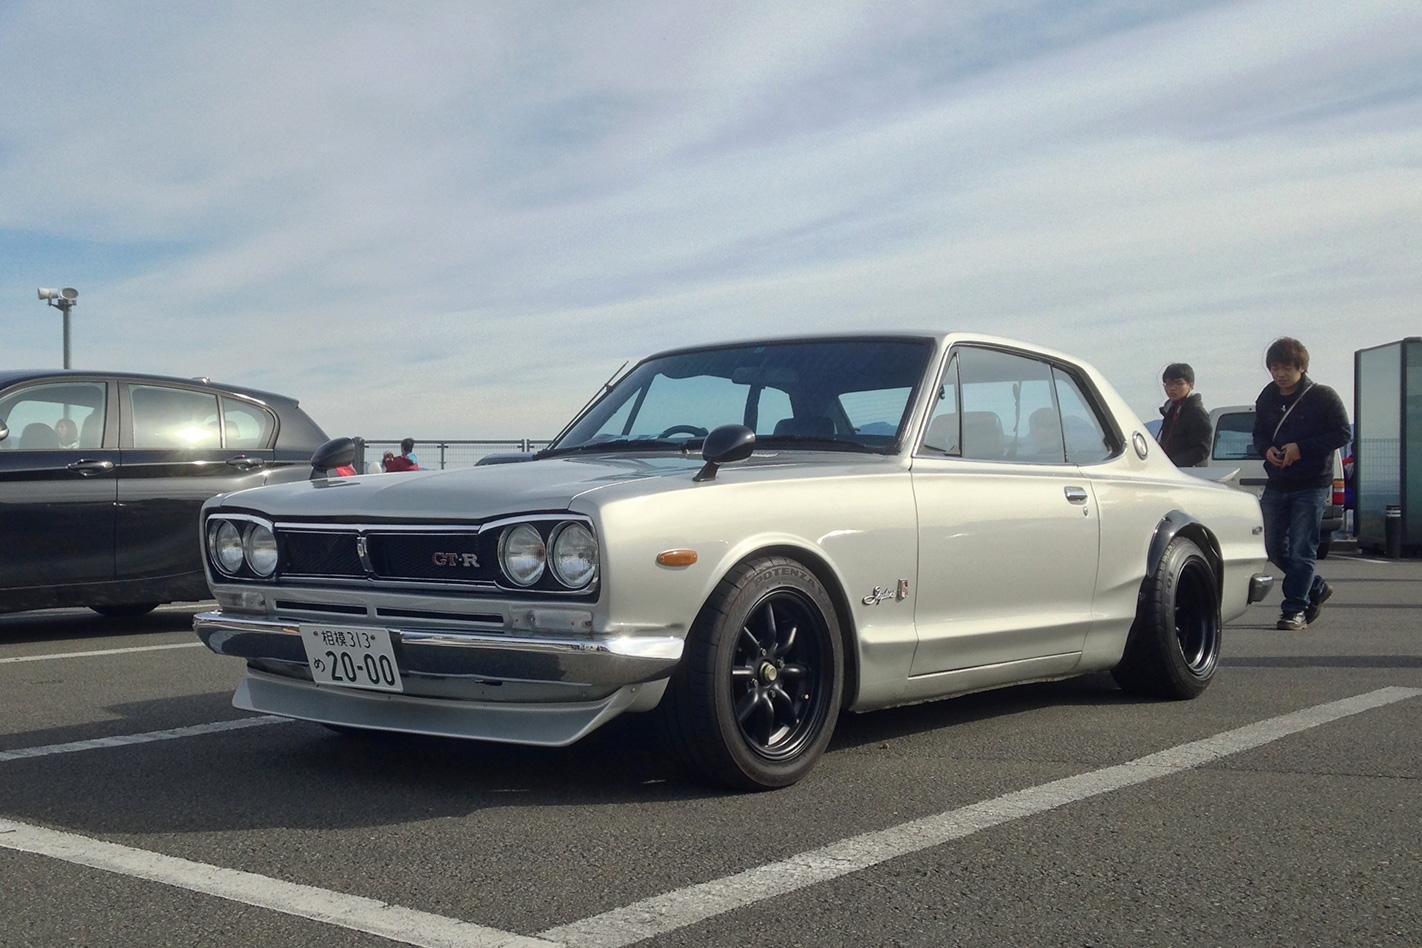 Hakosuka coupe Skyline GT-R